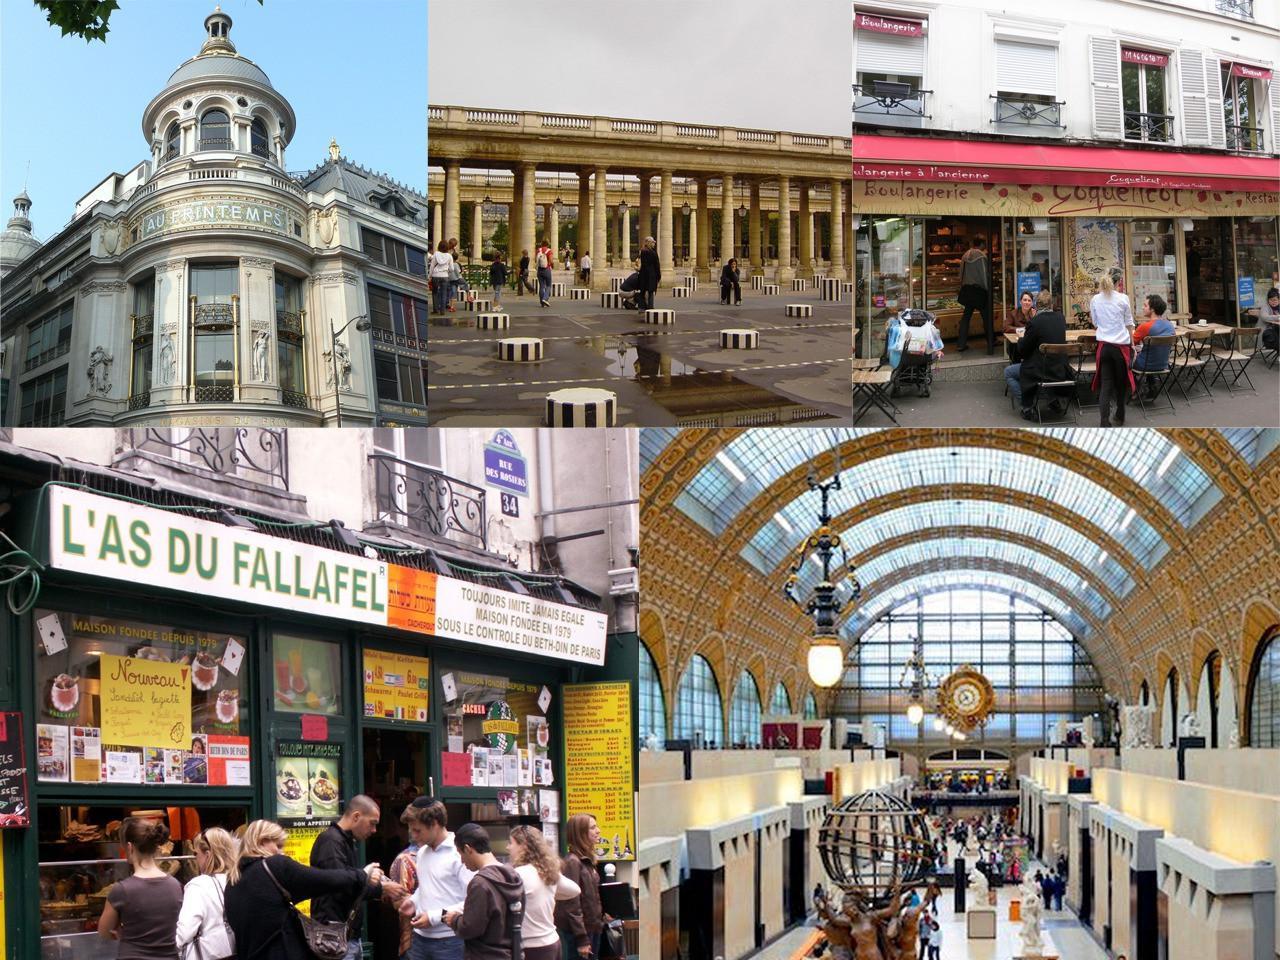 Salon De Jardin Original things to do in paris: 5 spot trendy pilihan penduduk lokal